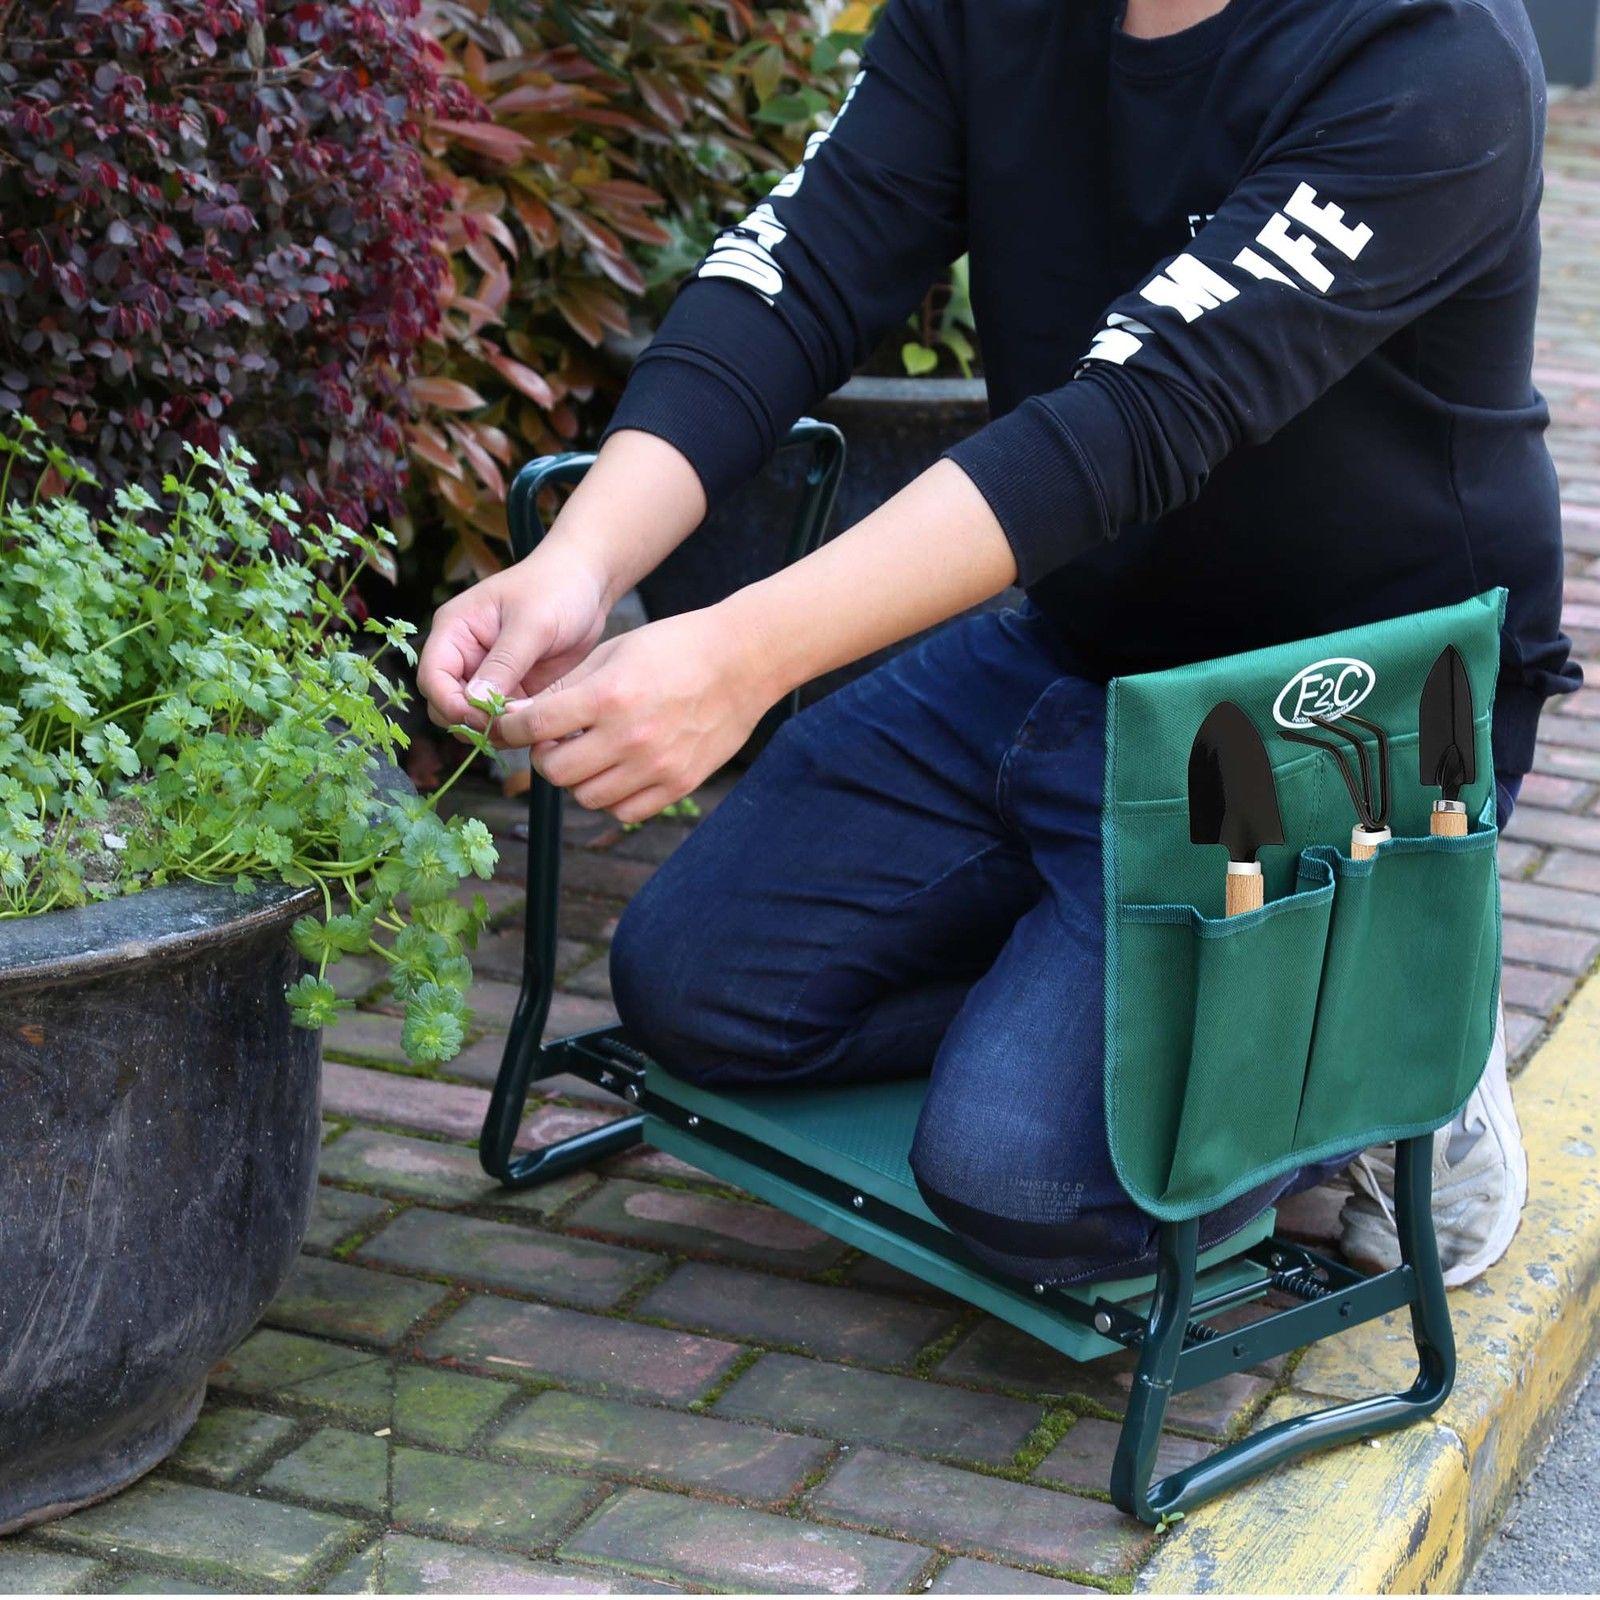 Zeny Foldable Garden Kneeler Bench Kneeling Stool Soft Cushion Seat EVA Pad w/ Tool Pouch